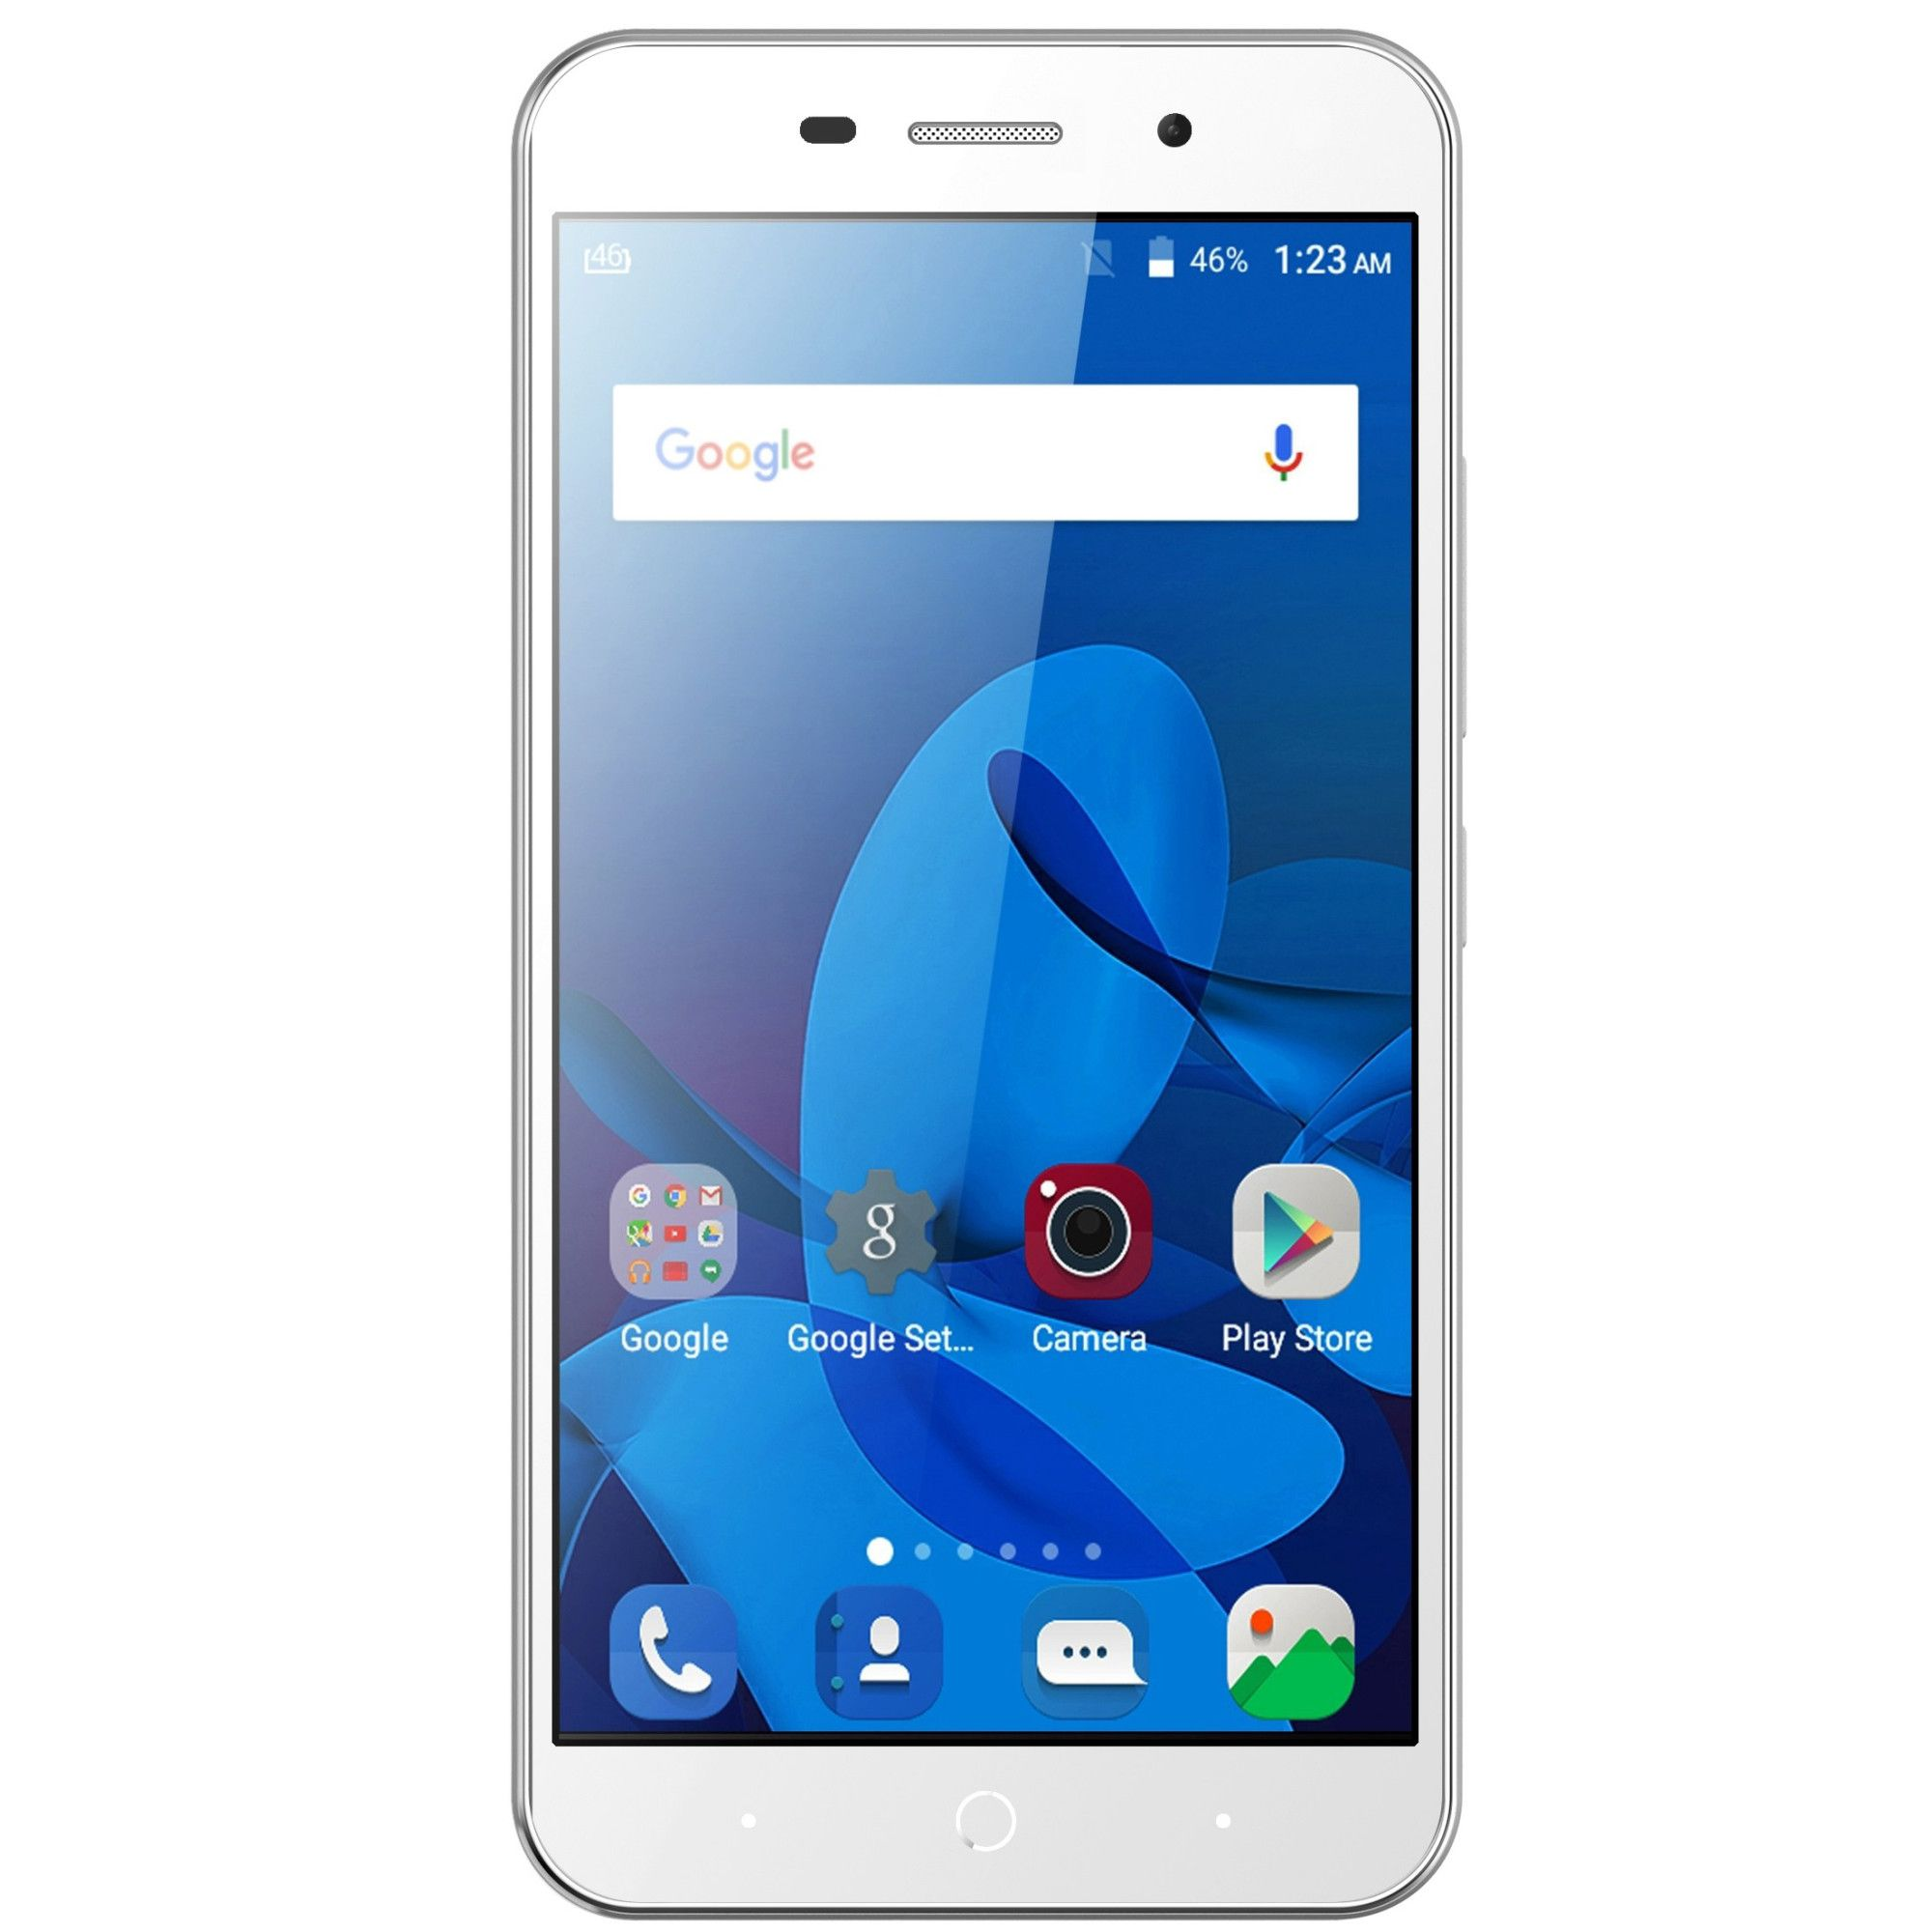 Telefon Mobil ZTE Blade A602 16GB Flash 1GB RAM Dual SIM 4G Silver